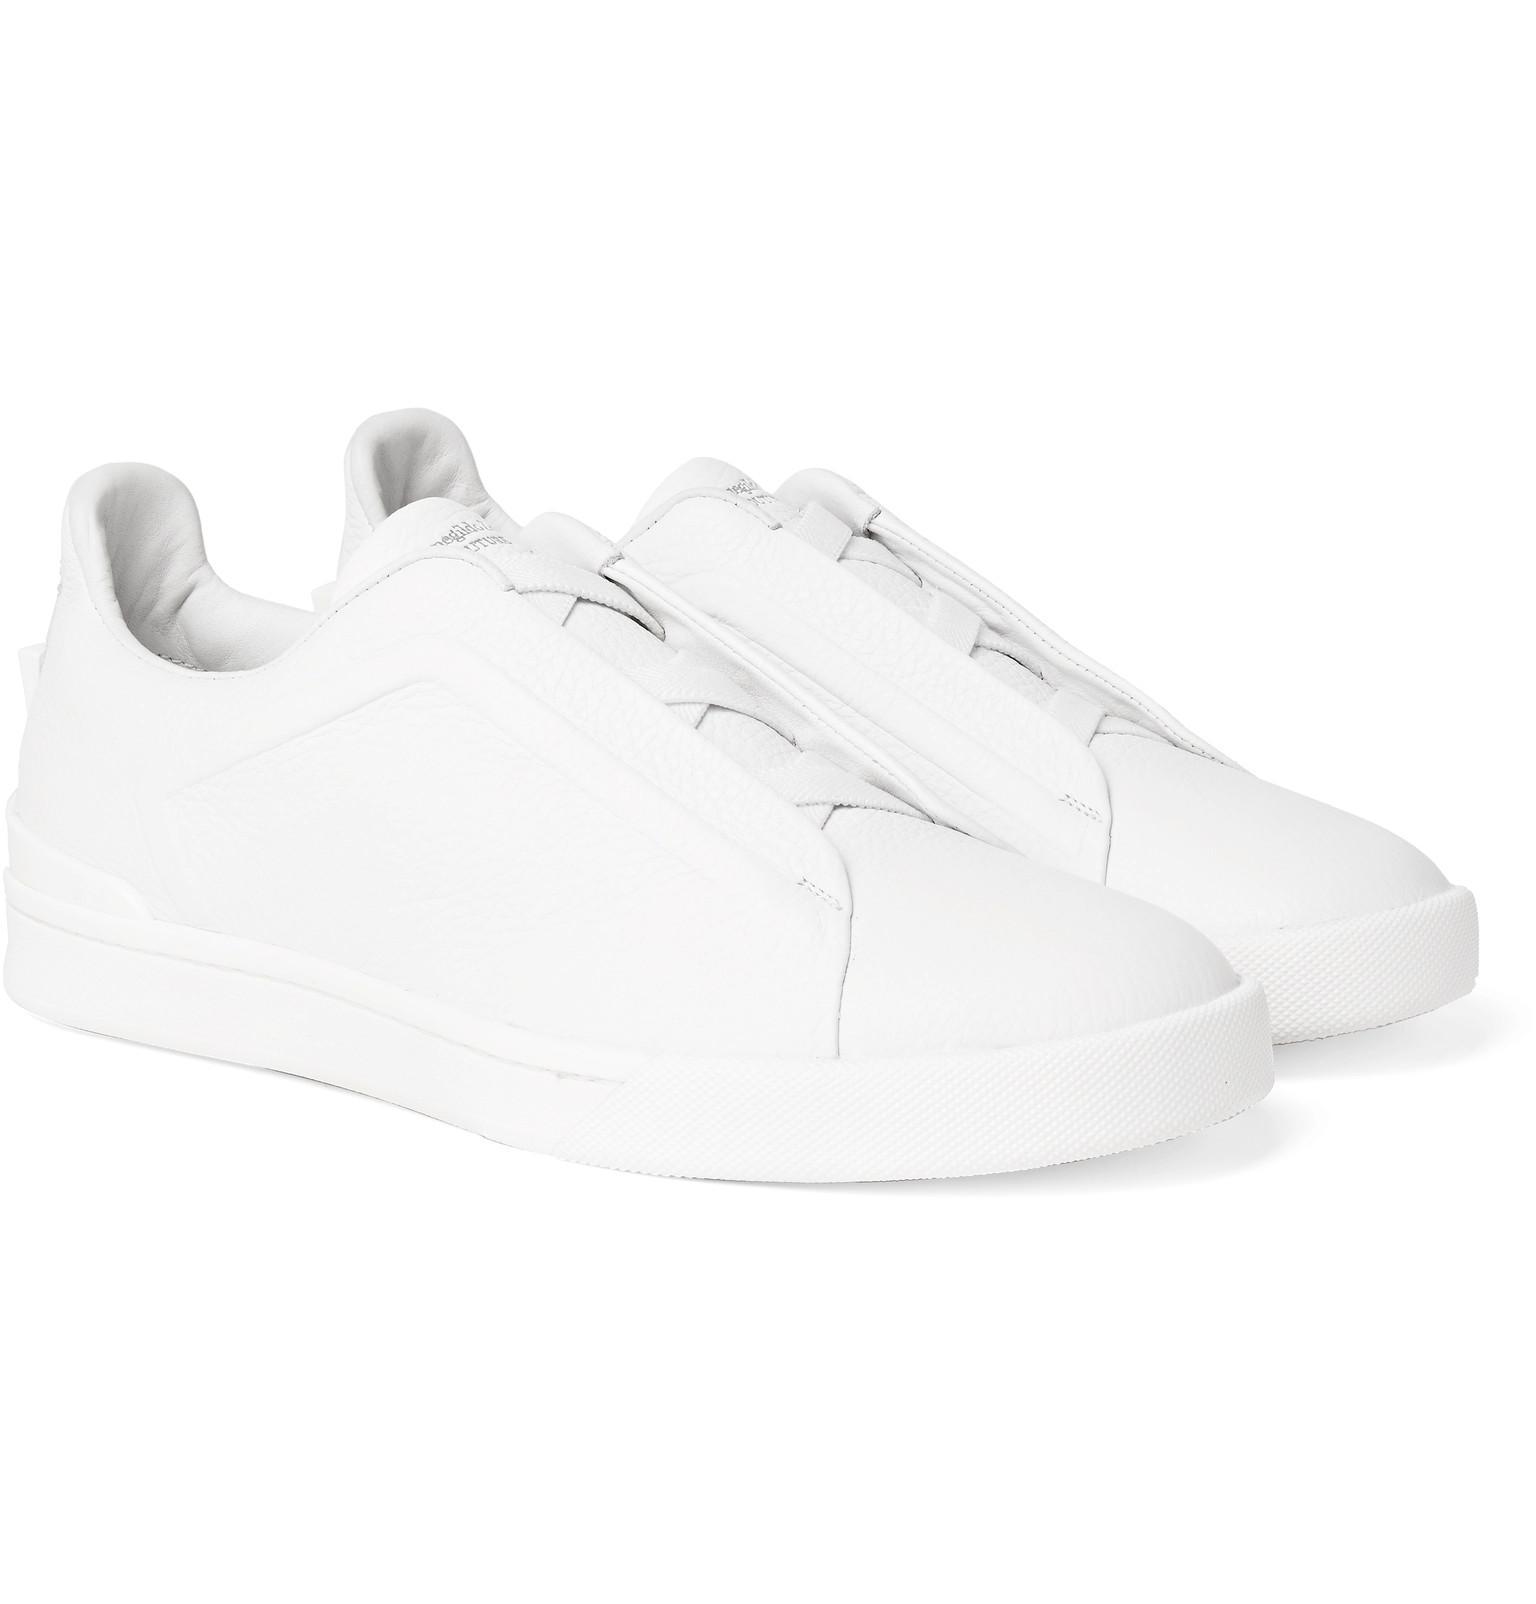 Nice En Ligne Ermenegildo Zegna Triple Stitch Full-grain Leather Slip-on Sneakers - White Pas Cher Grand Escompte Achats En Ligne Prix Le Plus Bas Amazone À Vendre KDyaJkv